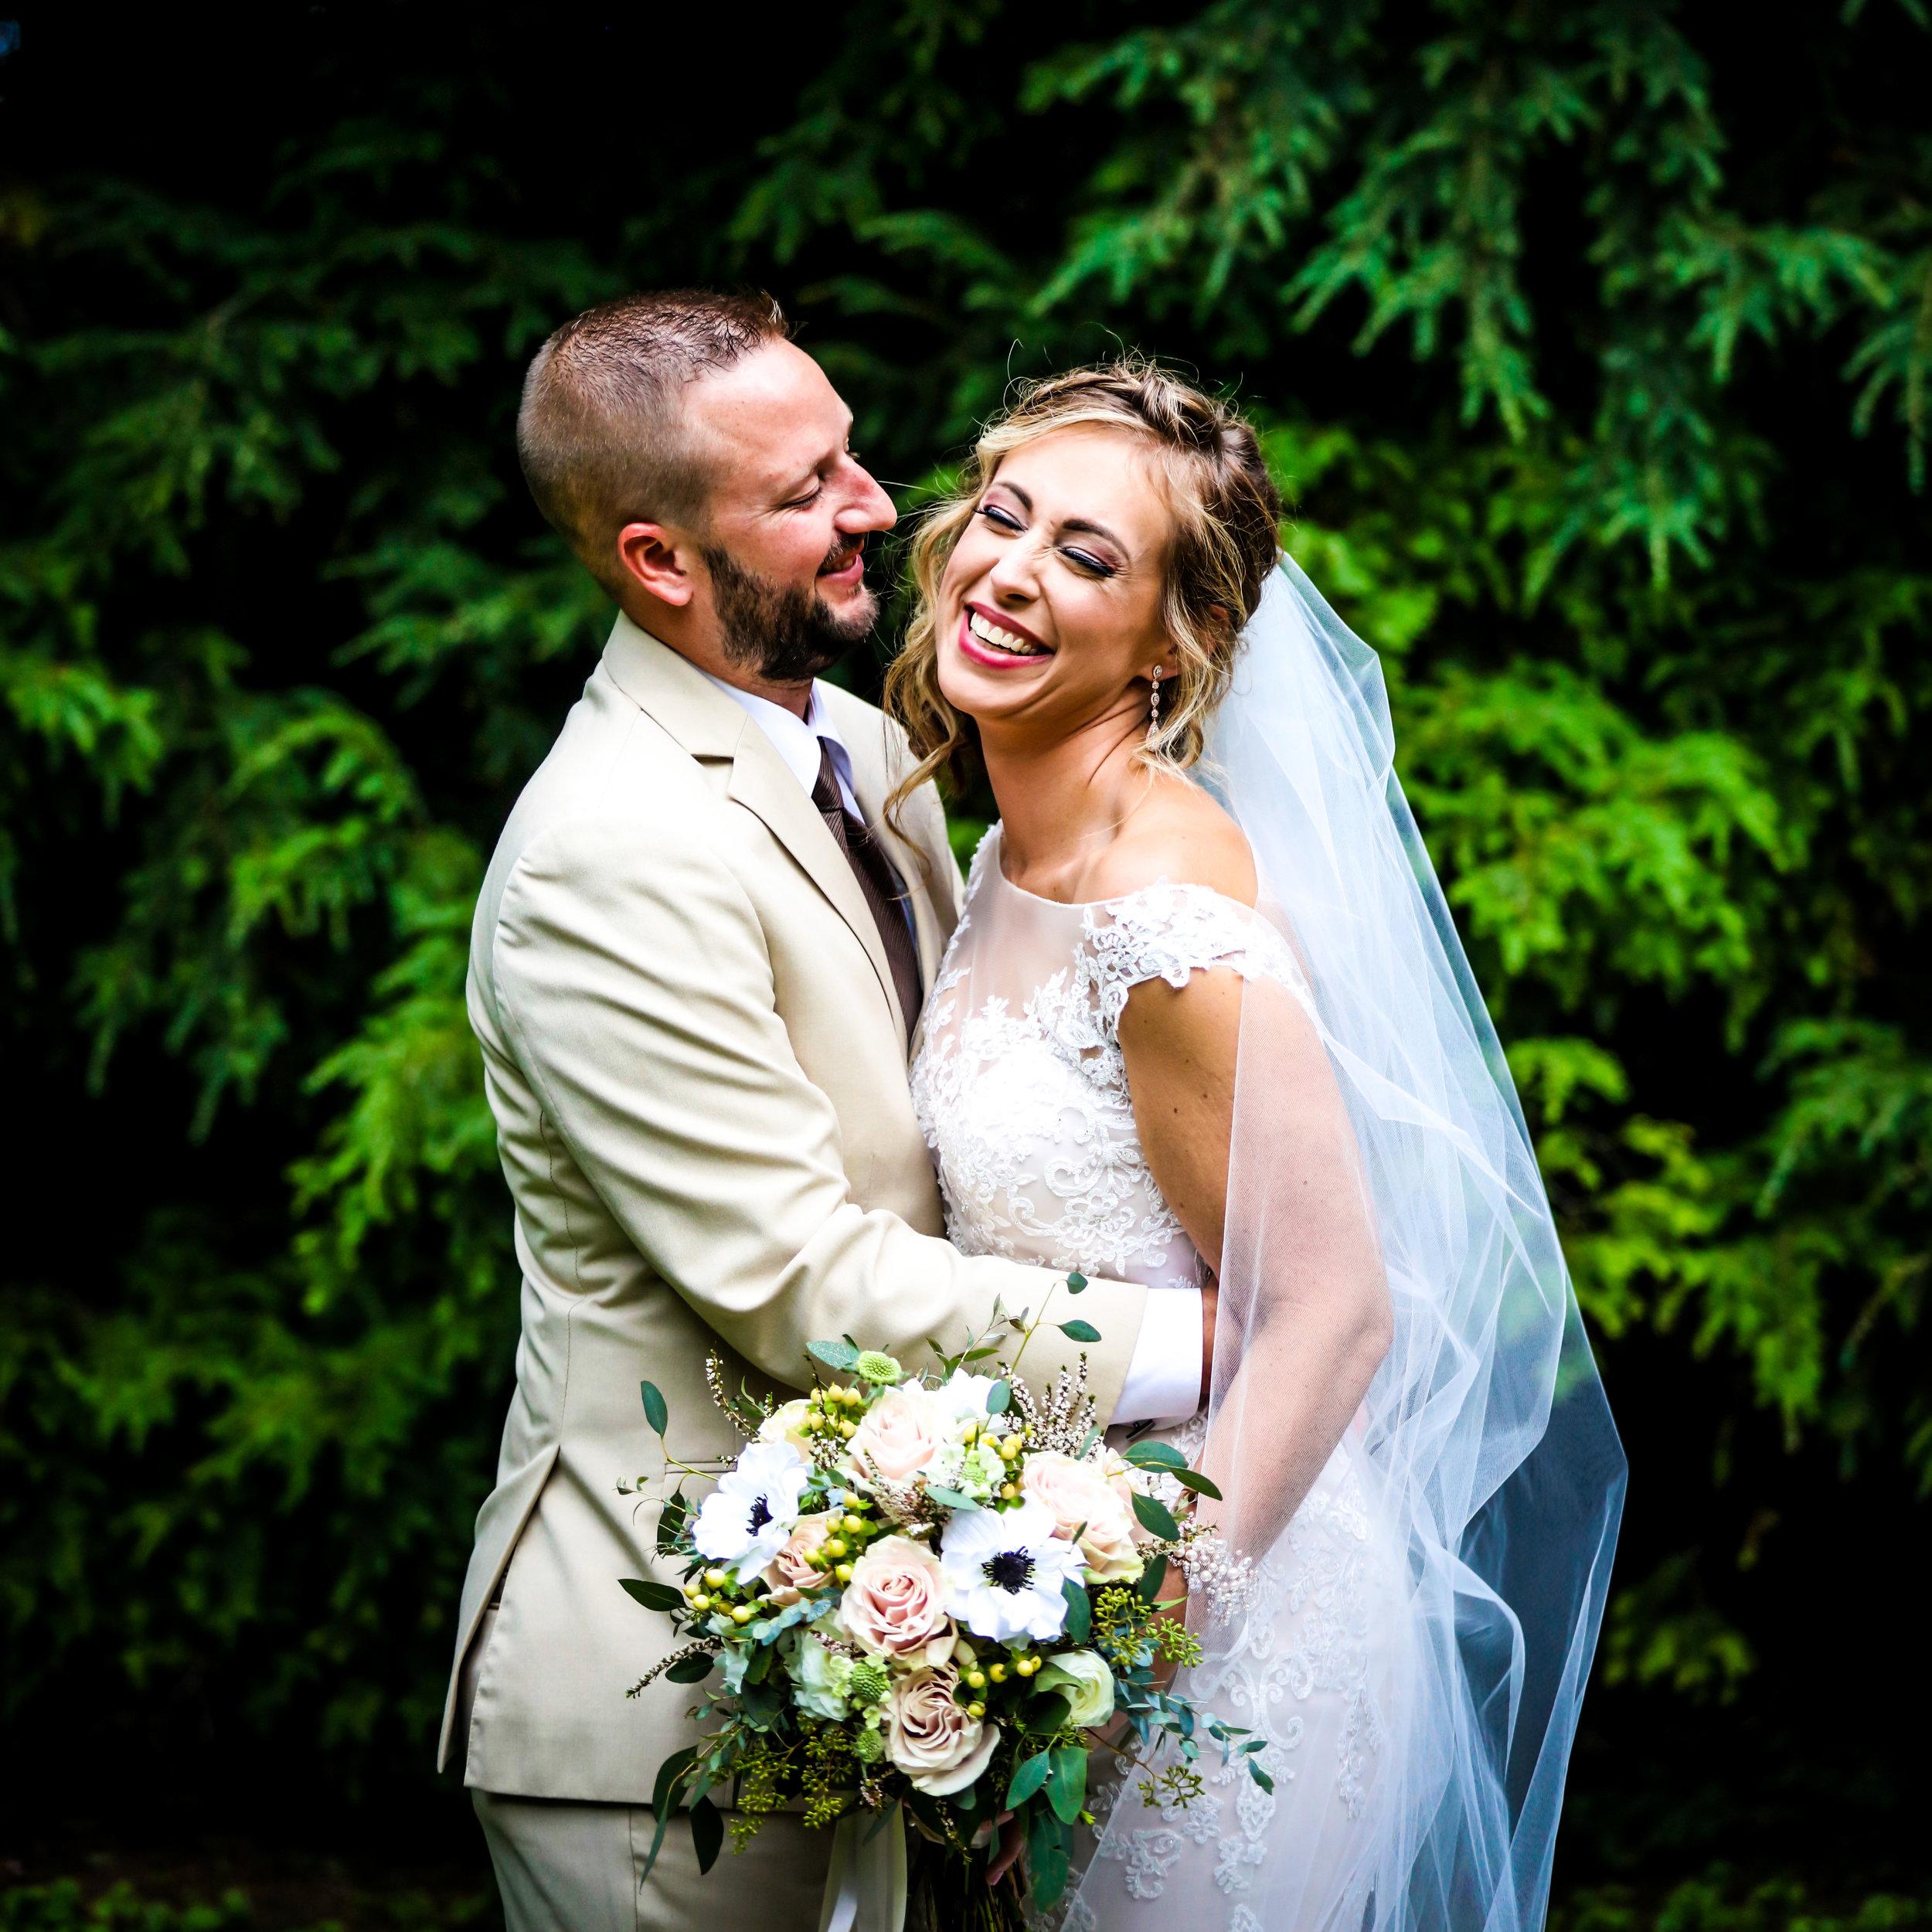 WeddingWebsite-48.jpg